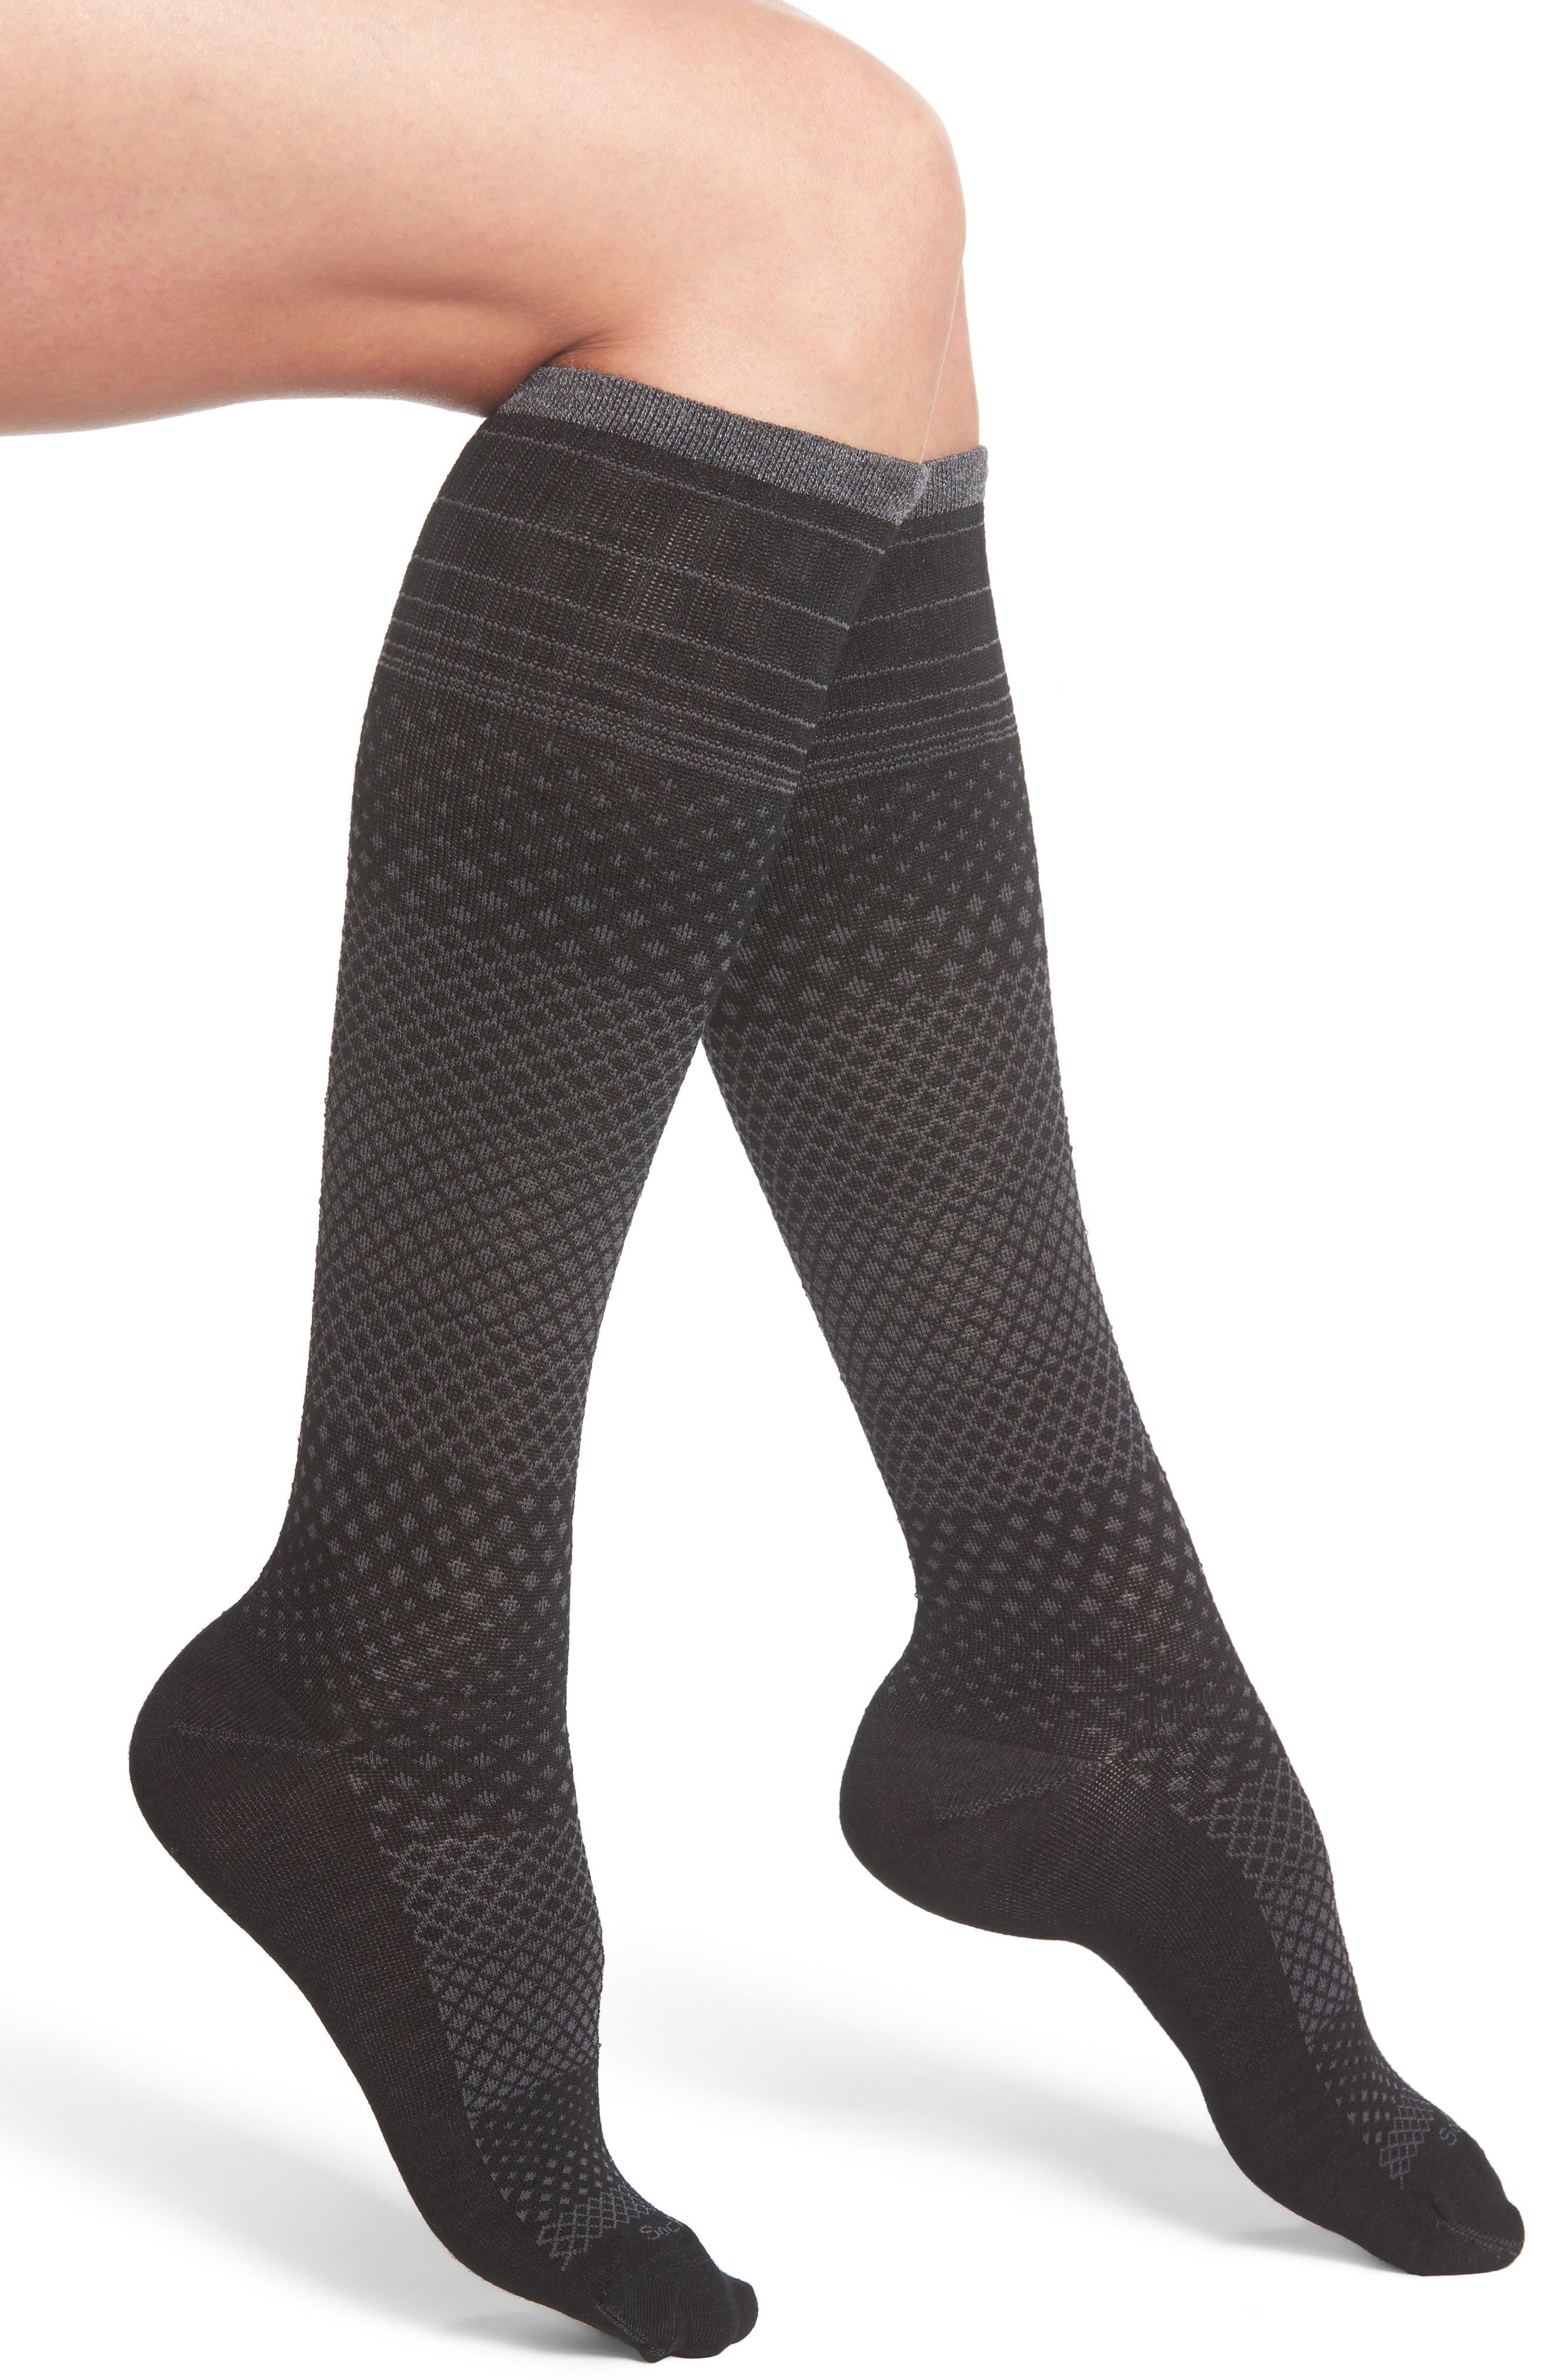 Micro Grade Compression Knee Socks,                             Main thumbnail 1, color,                             001